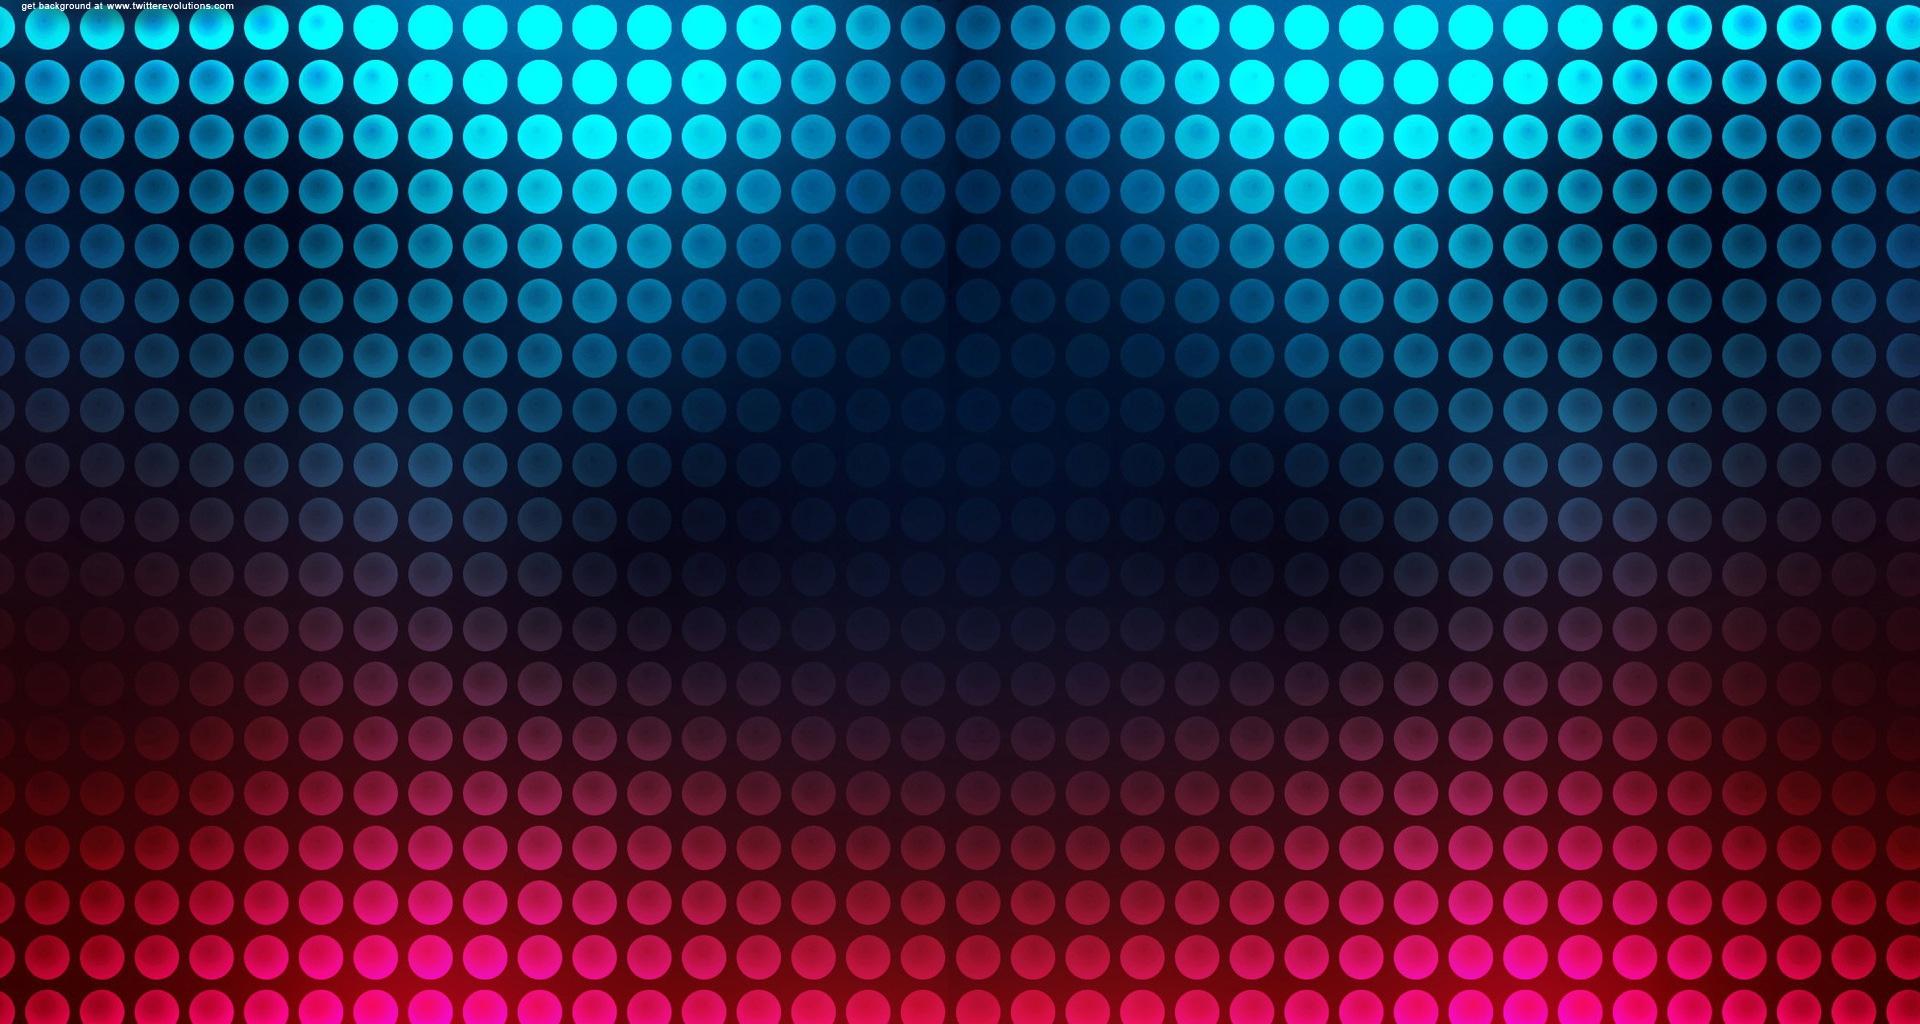 awesome-background-pattern-Lastest-Awesome-Pattern-Backgrounds-intended-for-awesome-back-wallpaper-wp3802656